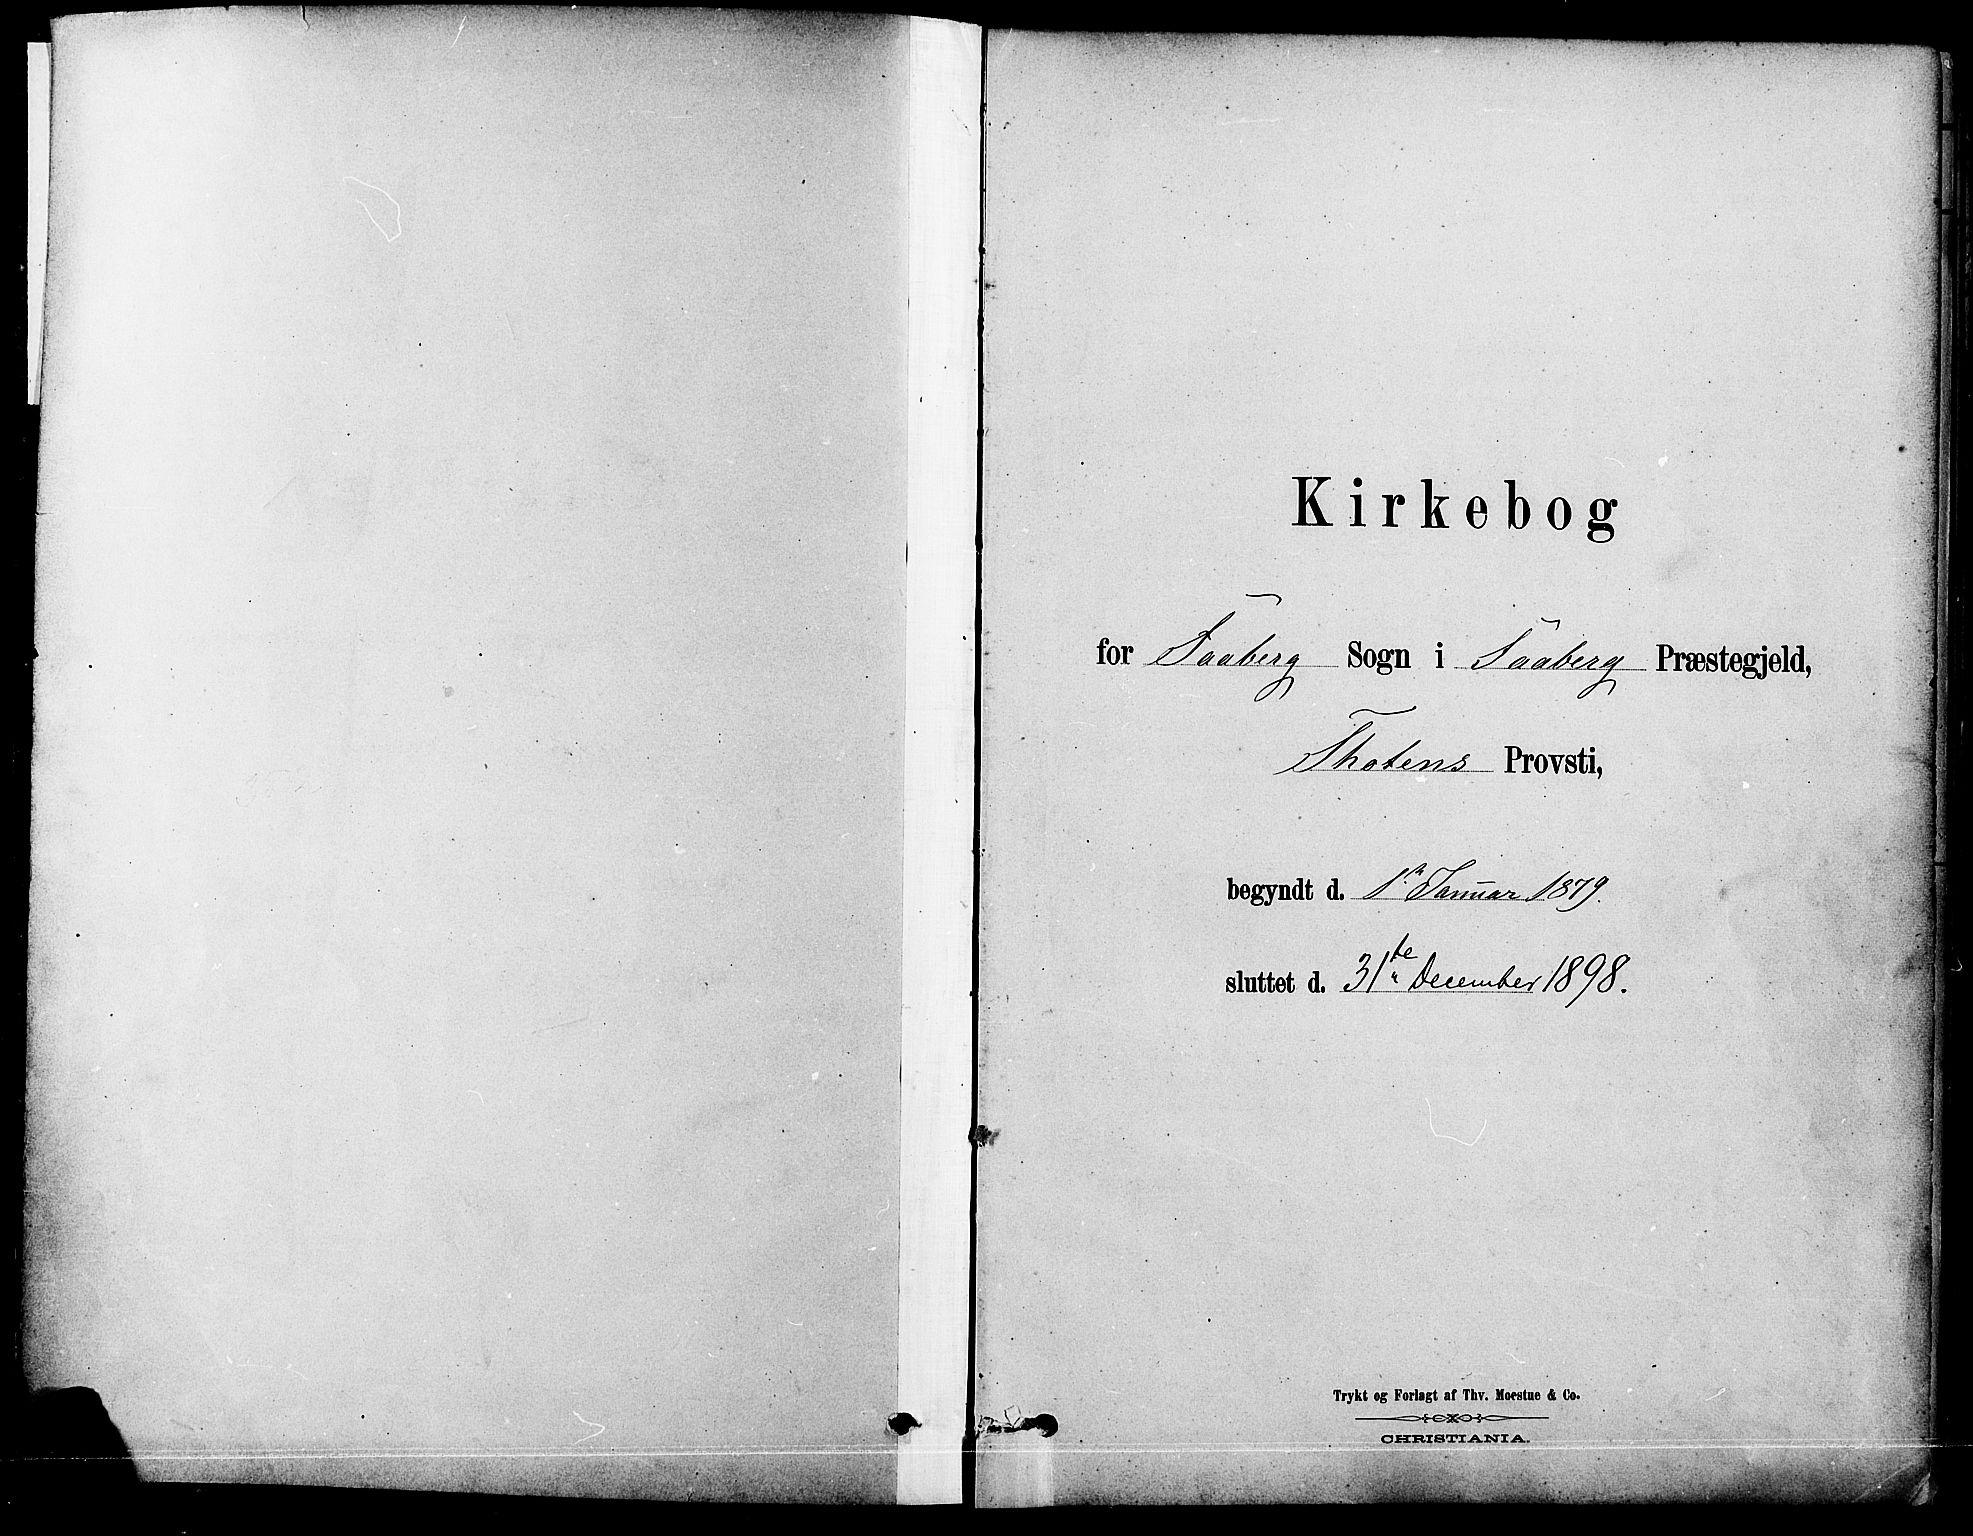 SAH, Fåberg prestekontor, Ministerialbok nr. 8, 1879-1898